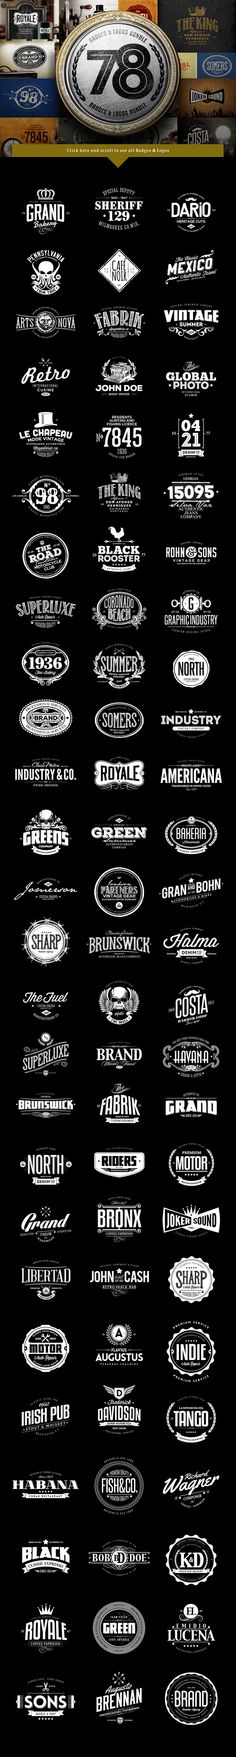 78 Badges & Logos Bundle by Easybrandz on Creative Market